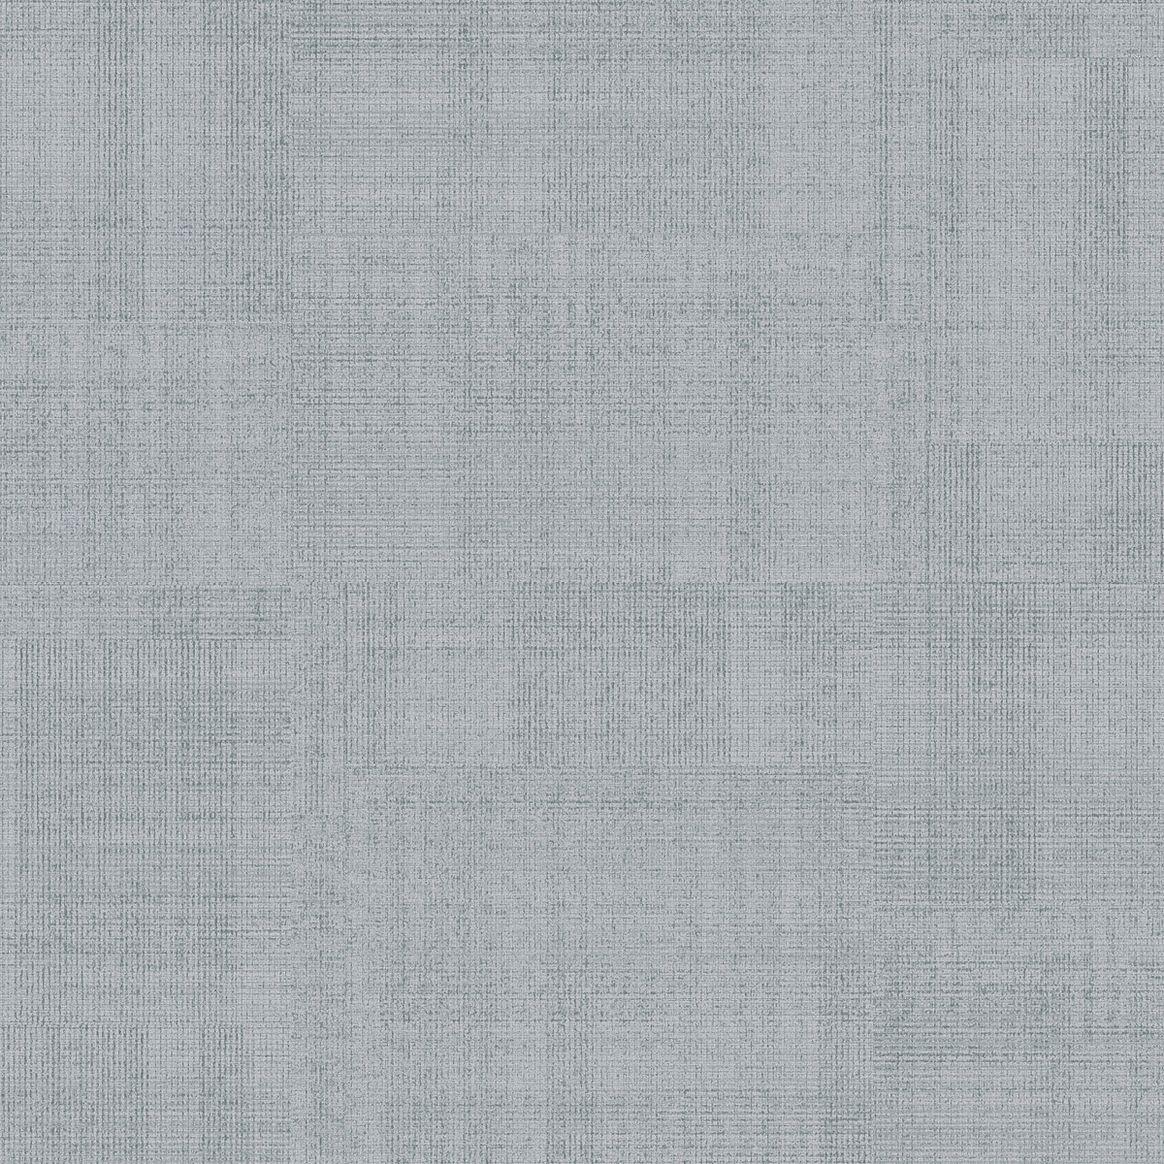 Saltgrass tile